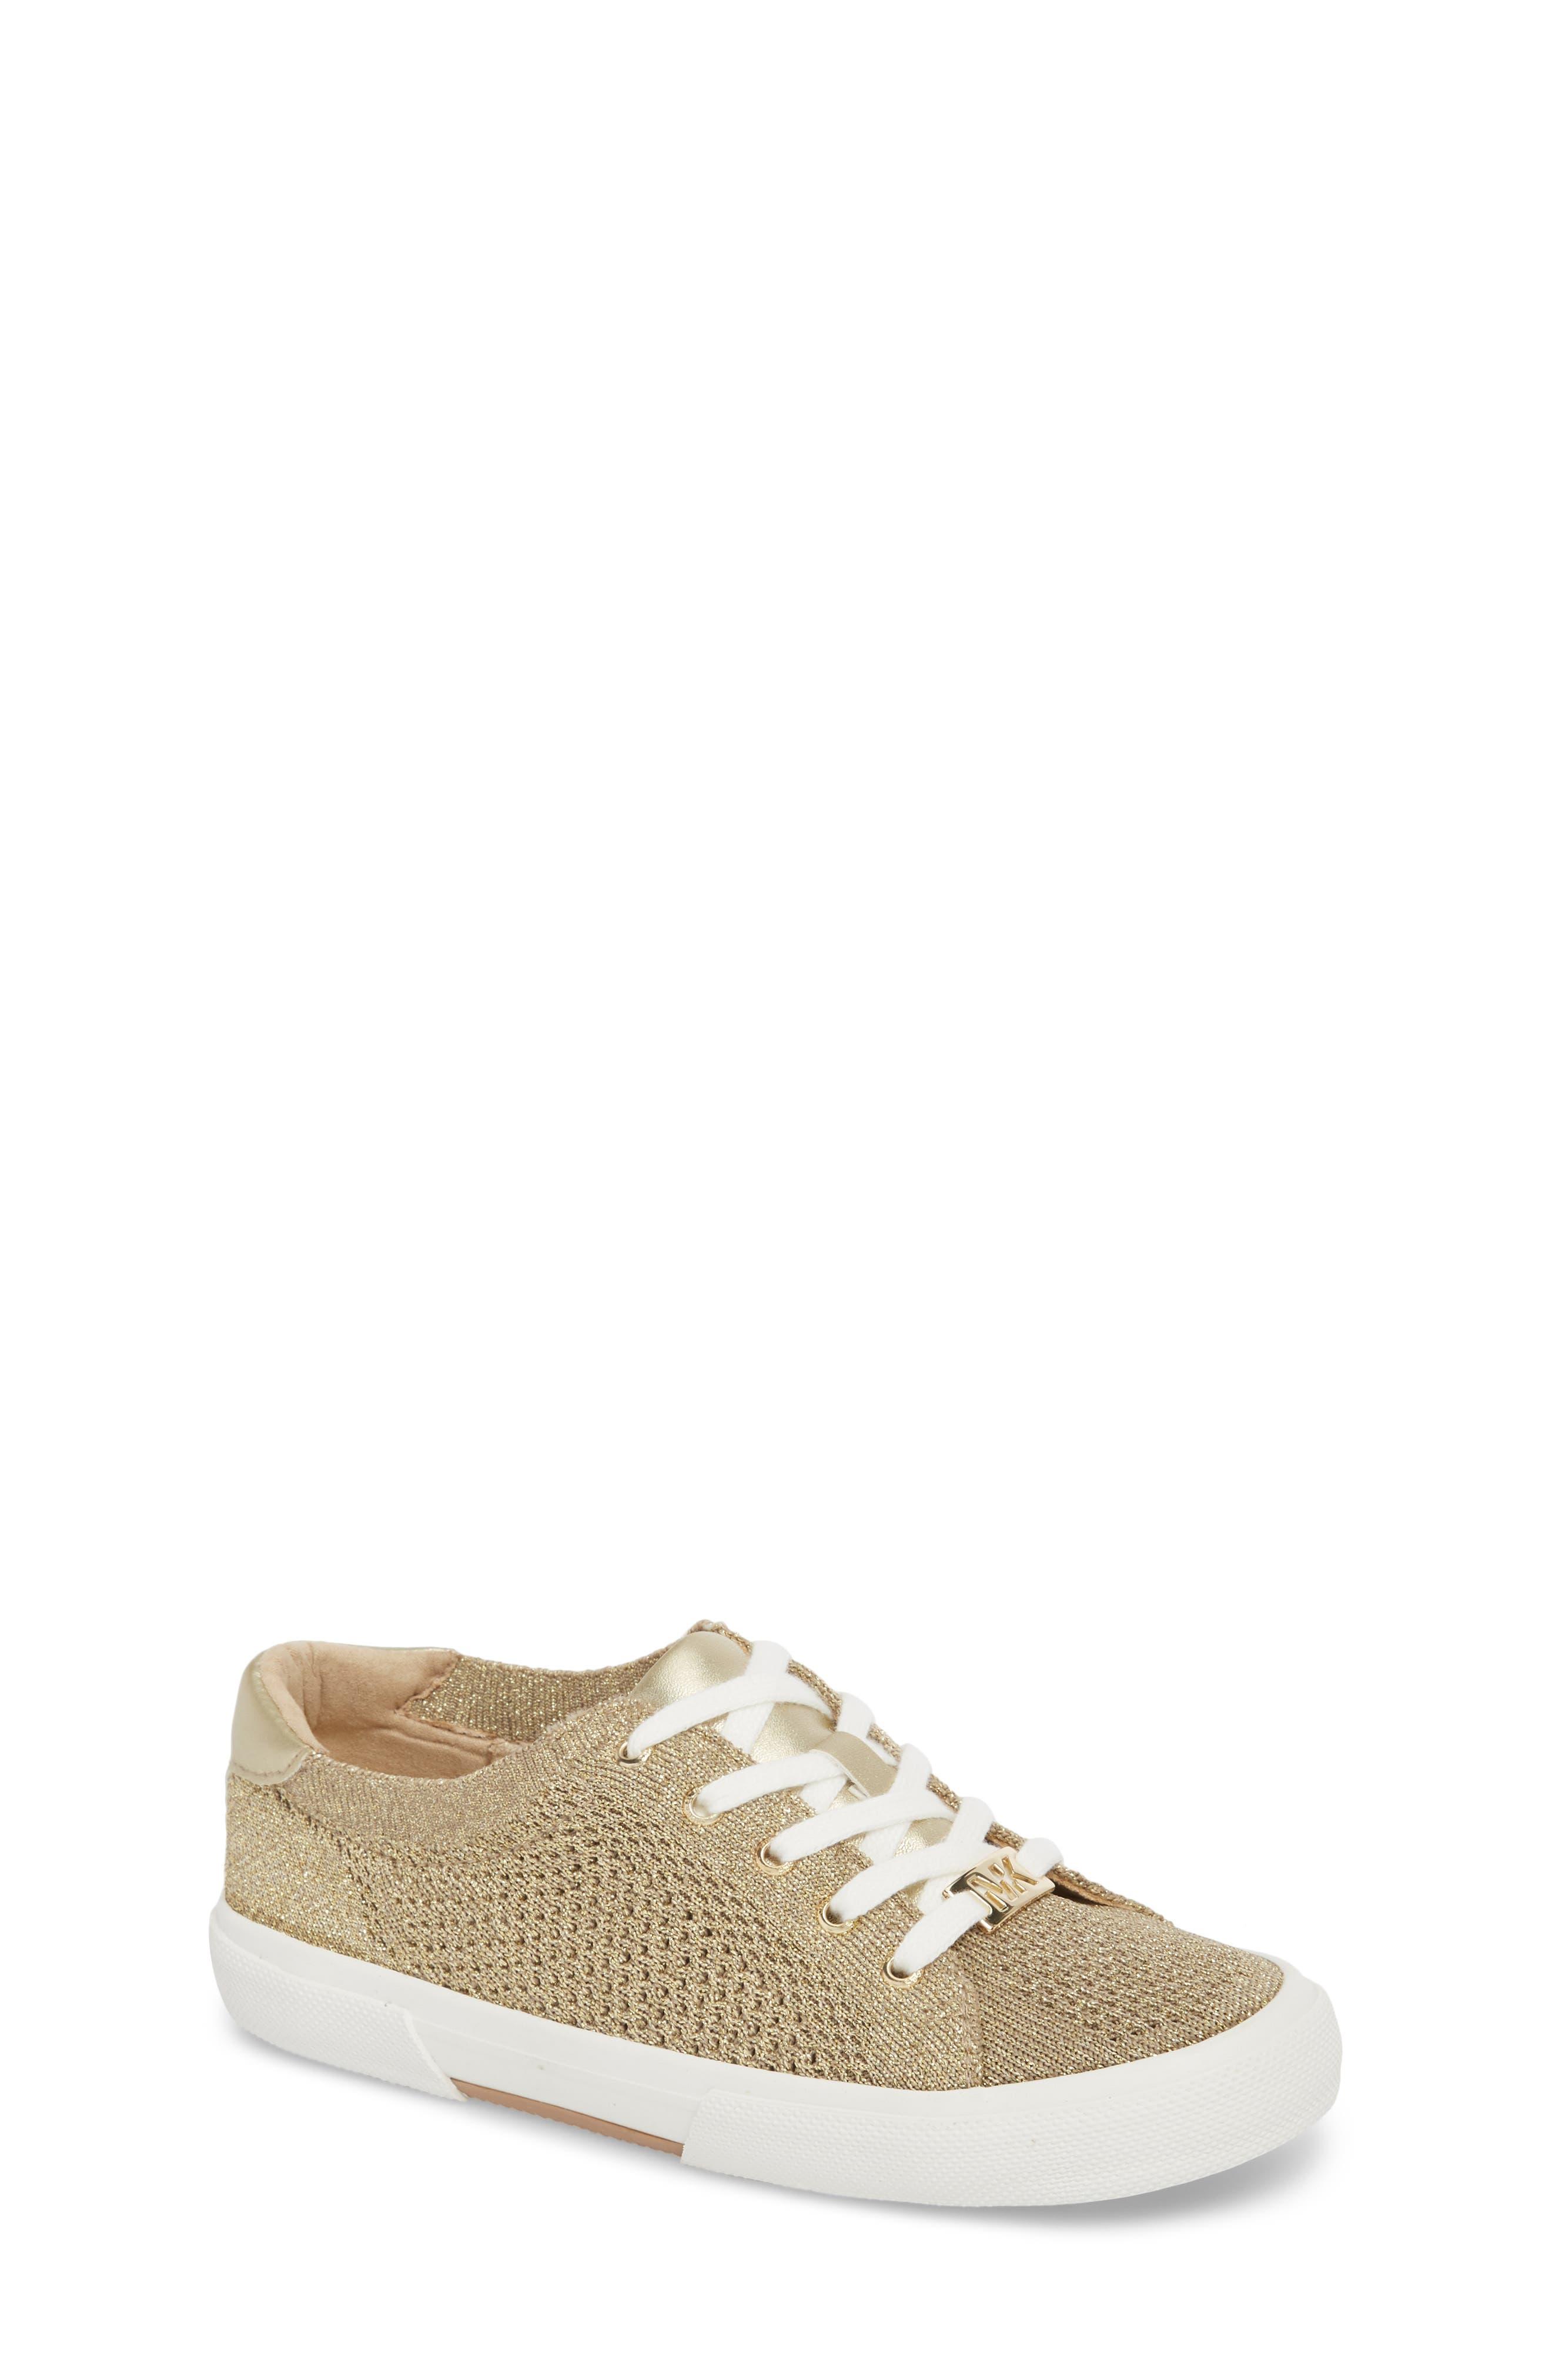 Ima Metallic Knit Sneaker,                         Main,                         color, GOLD